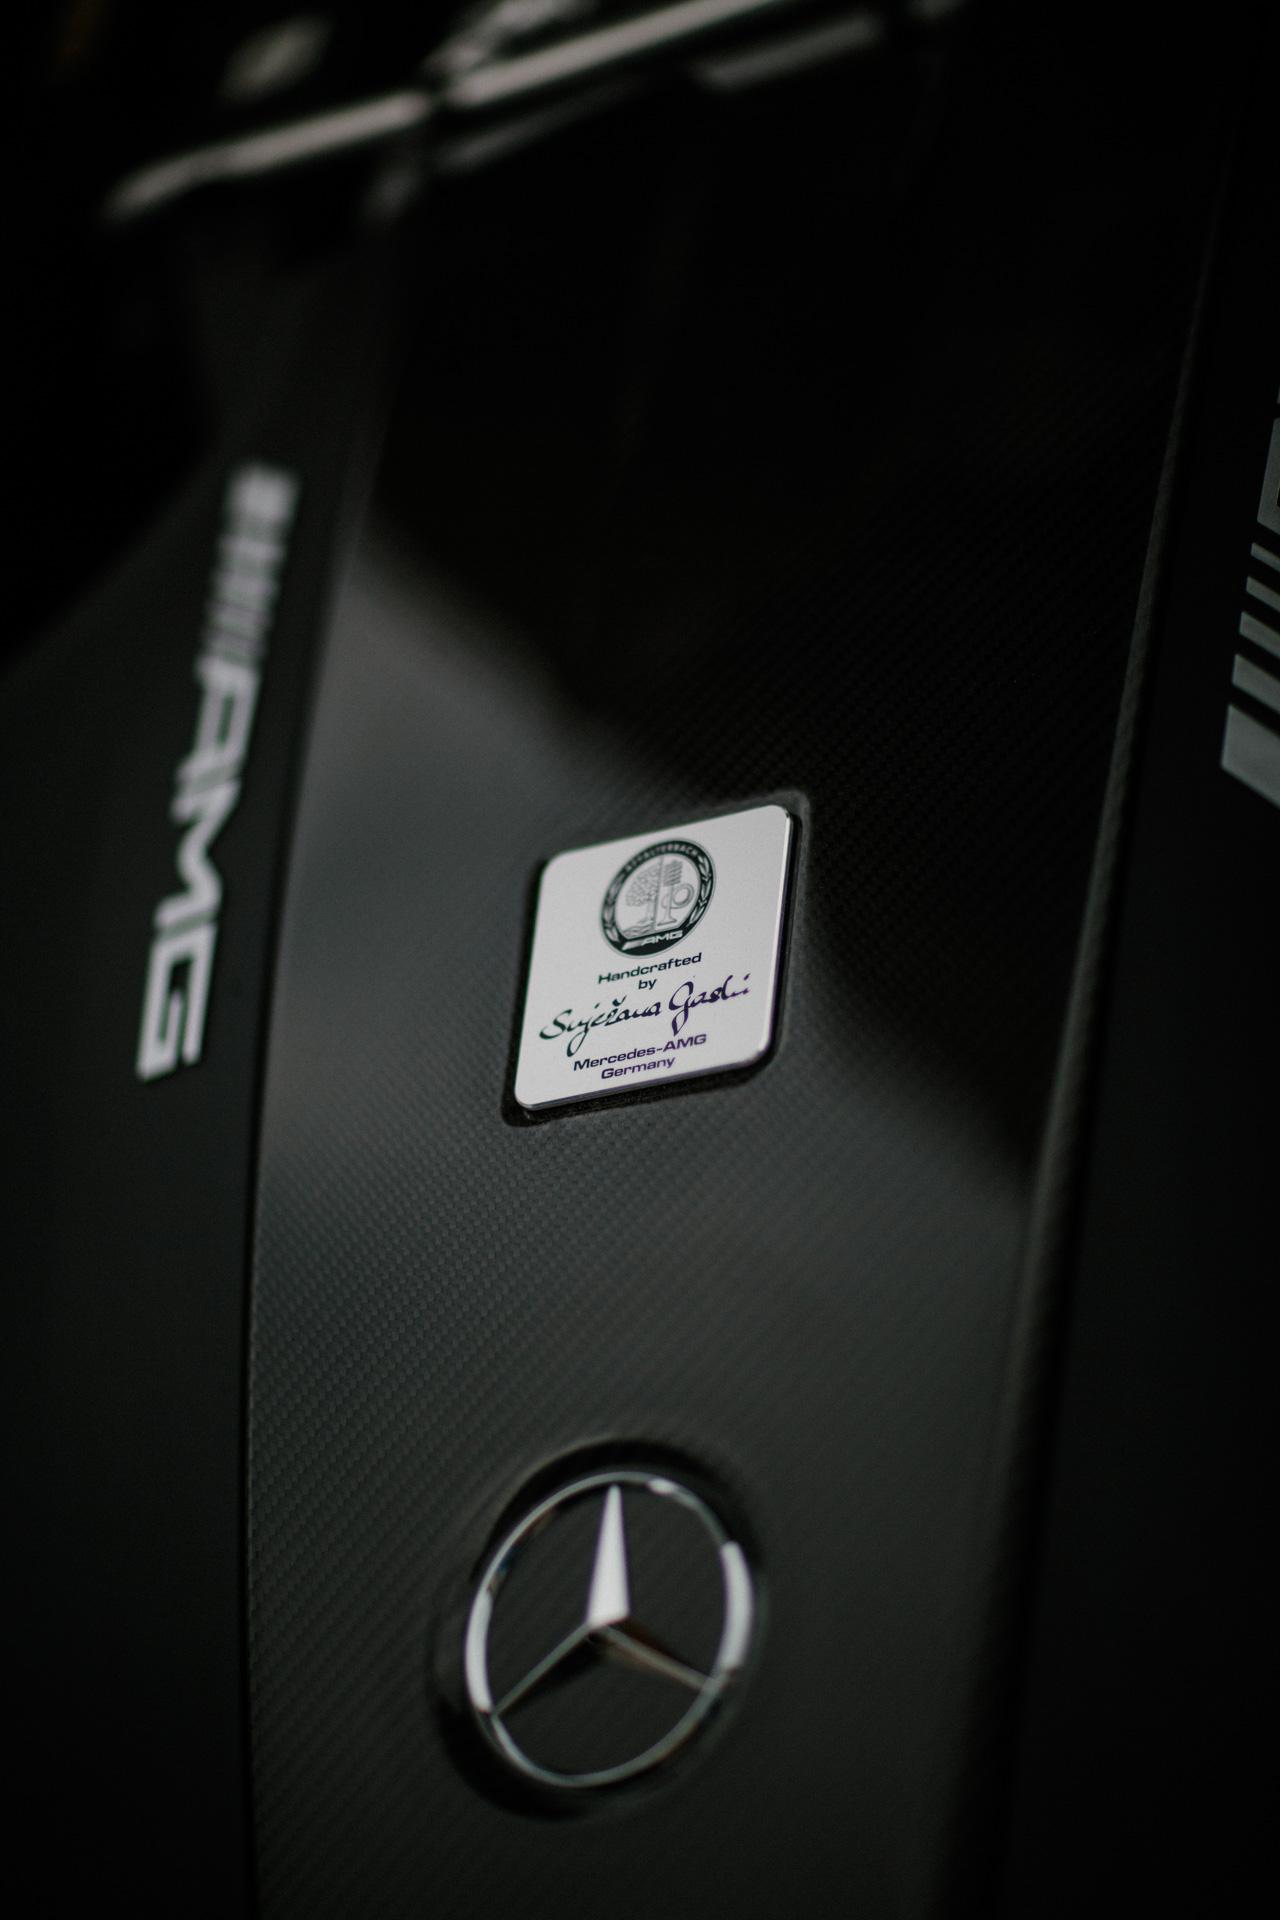 Mercedes_Benz_AMG_2017_Edits (22 of 23).jpg